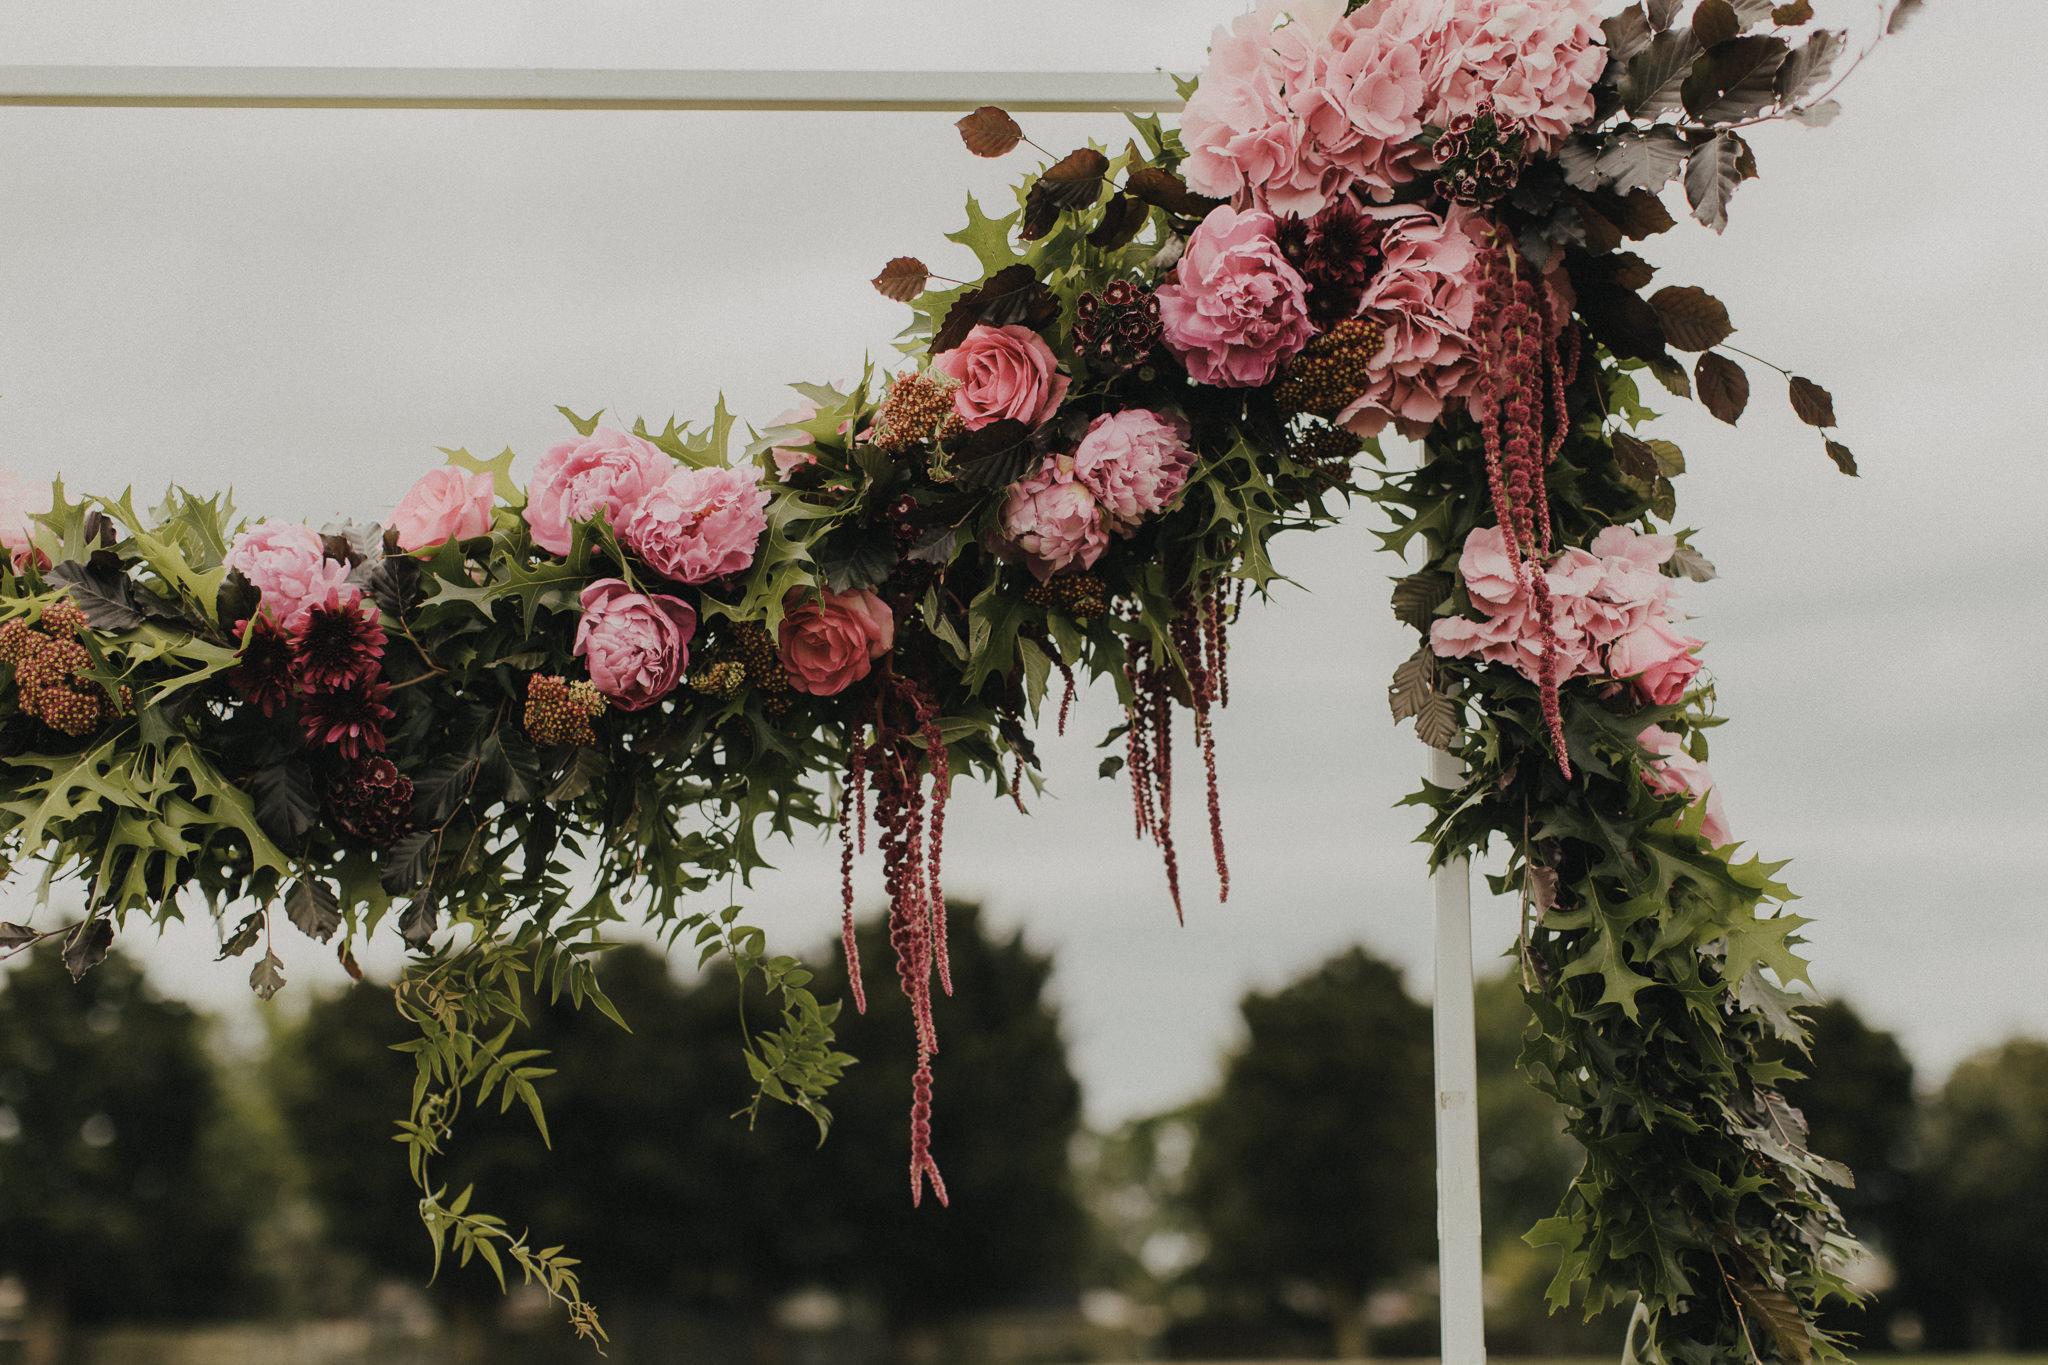 On My Hand Florist - Real wedding portfolio - Sasha and Josh - hanging flower arrangement